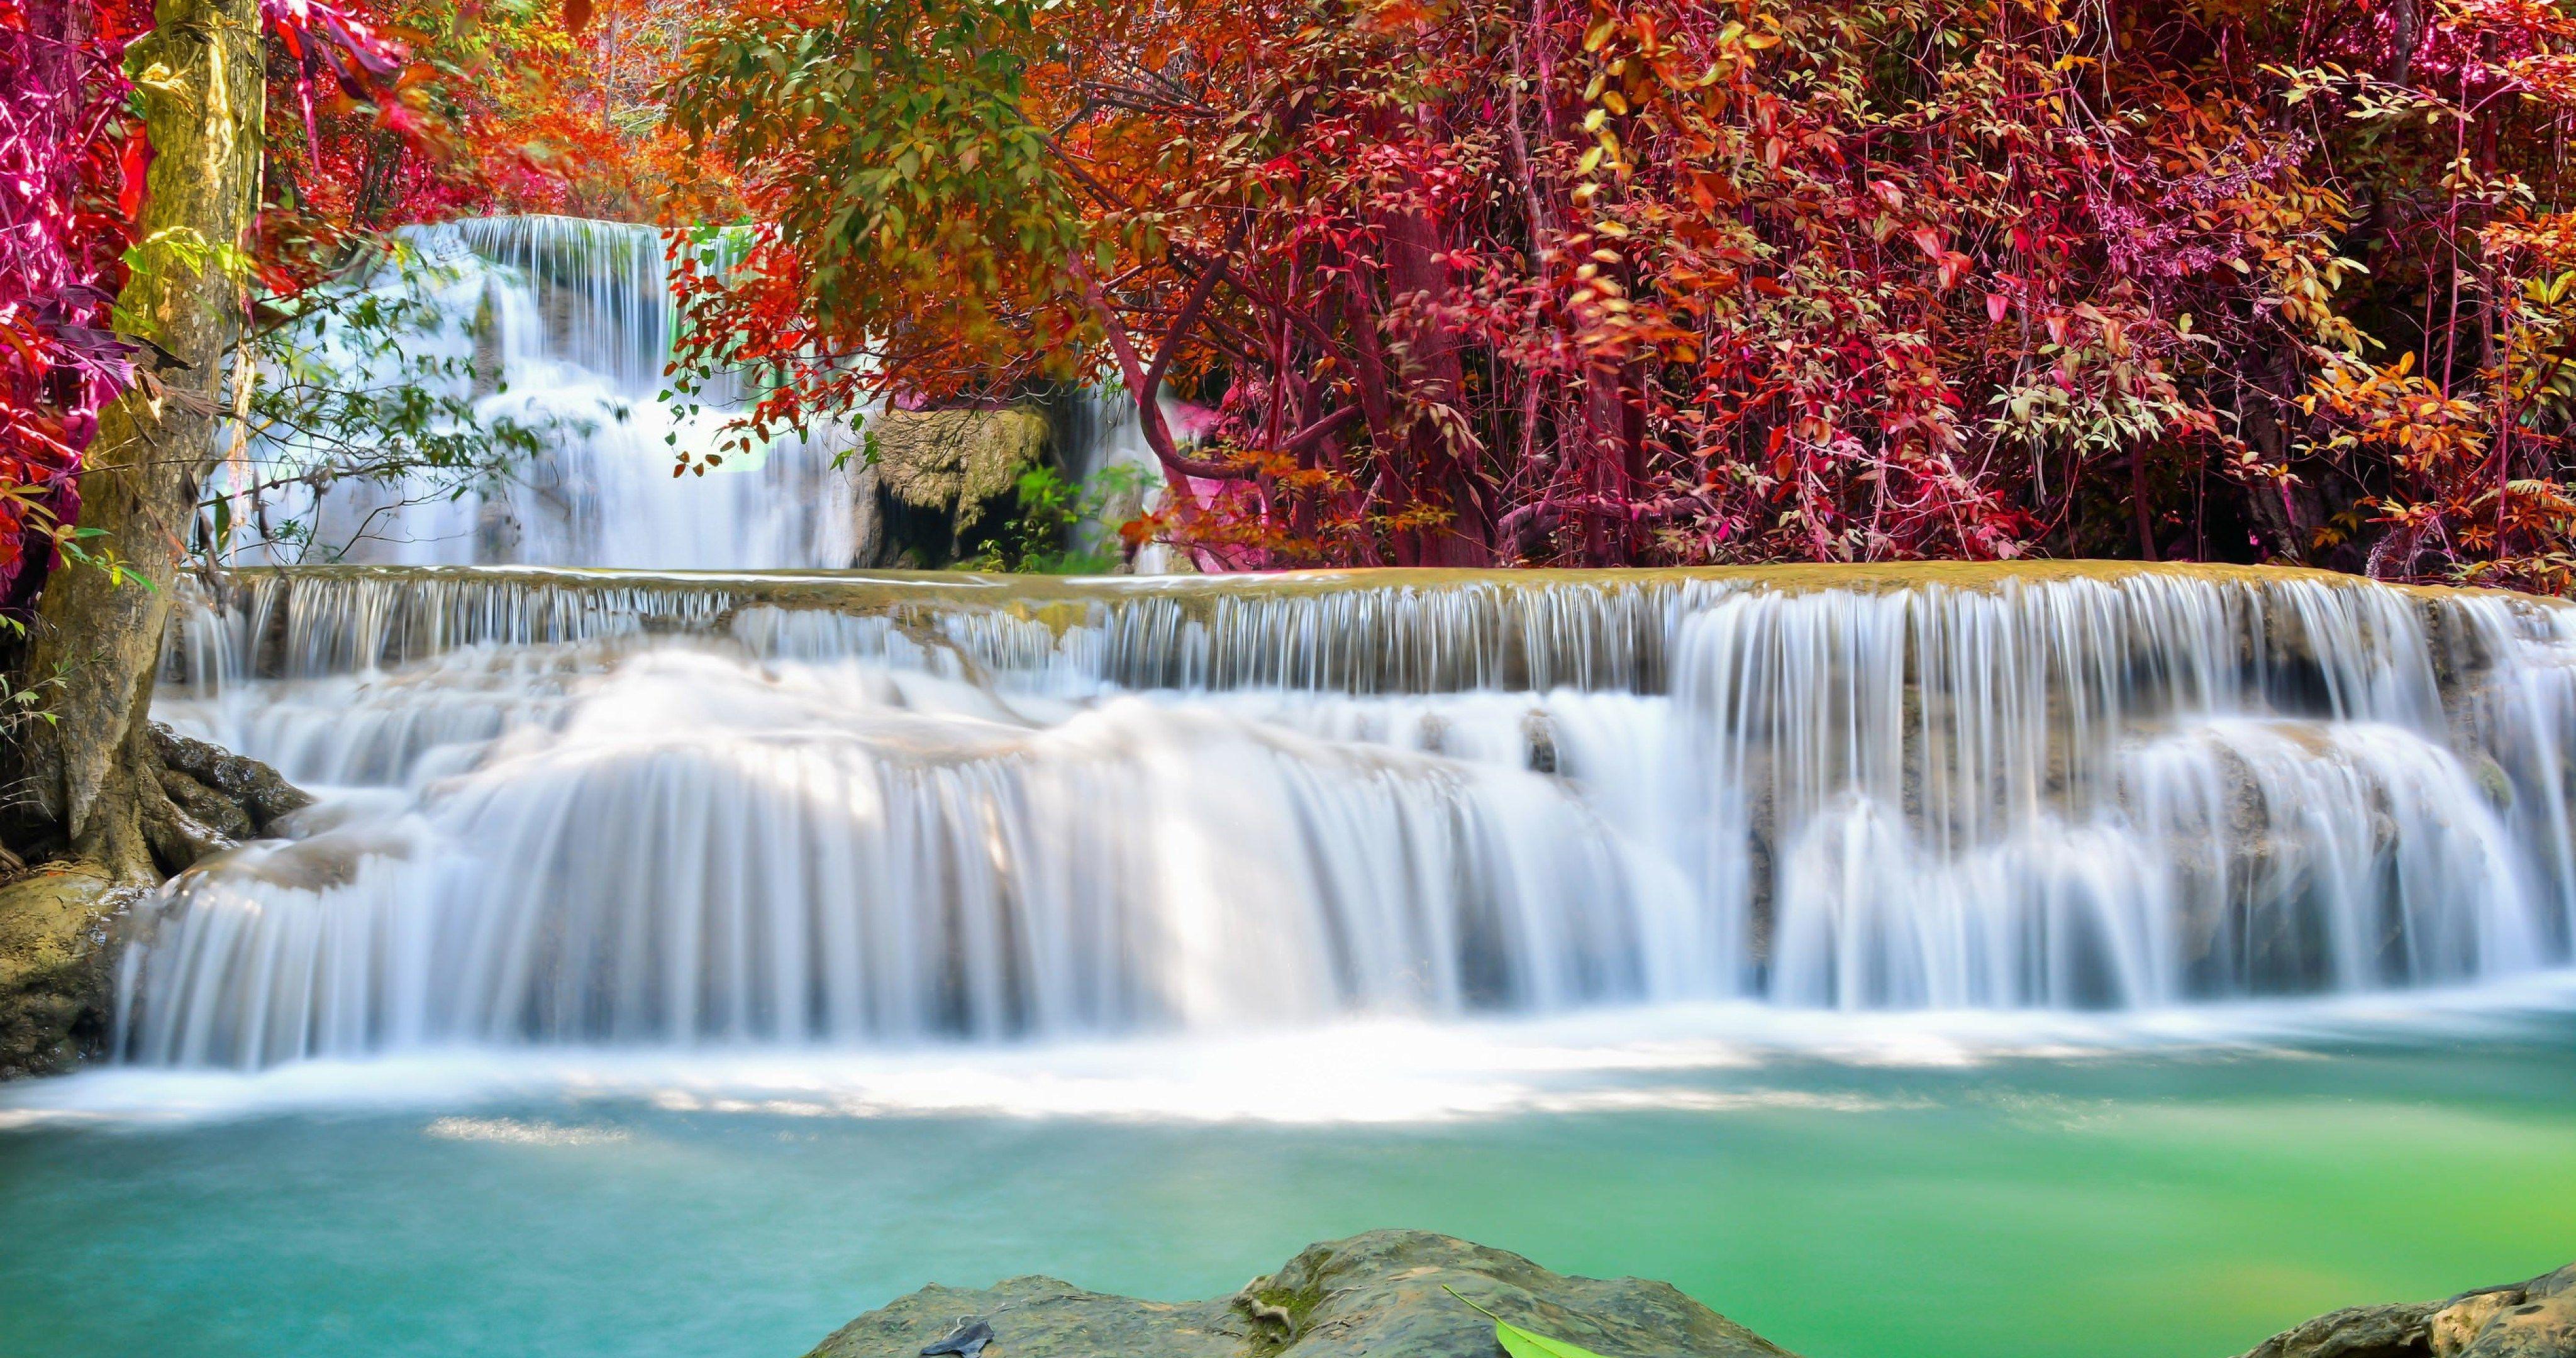 Autumn Waterfall 4k Ultra Hd Wallpaper Waterfall Wallpaper Waterfall Autumn Waterfalls